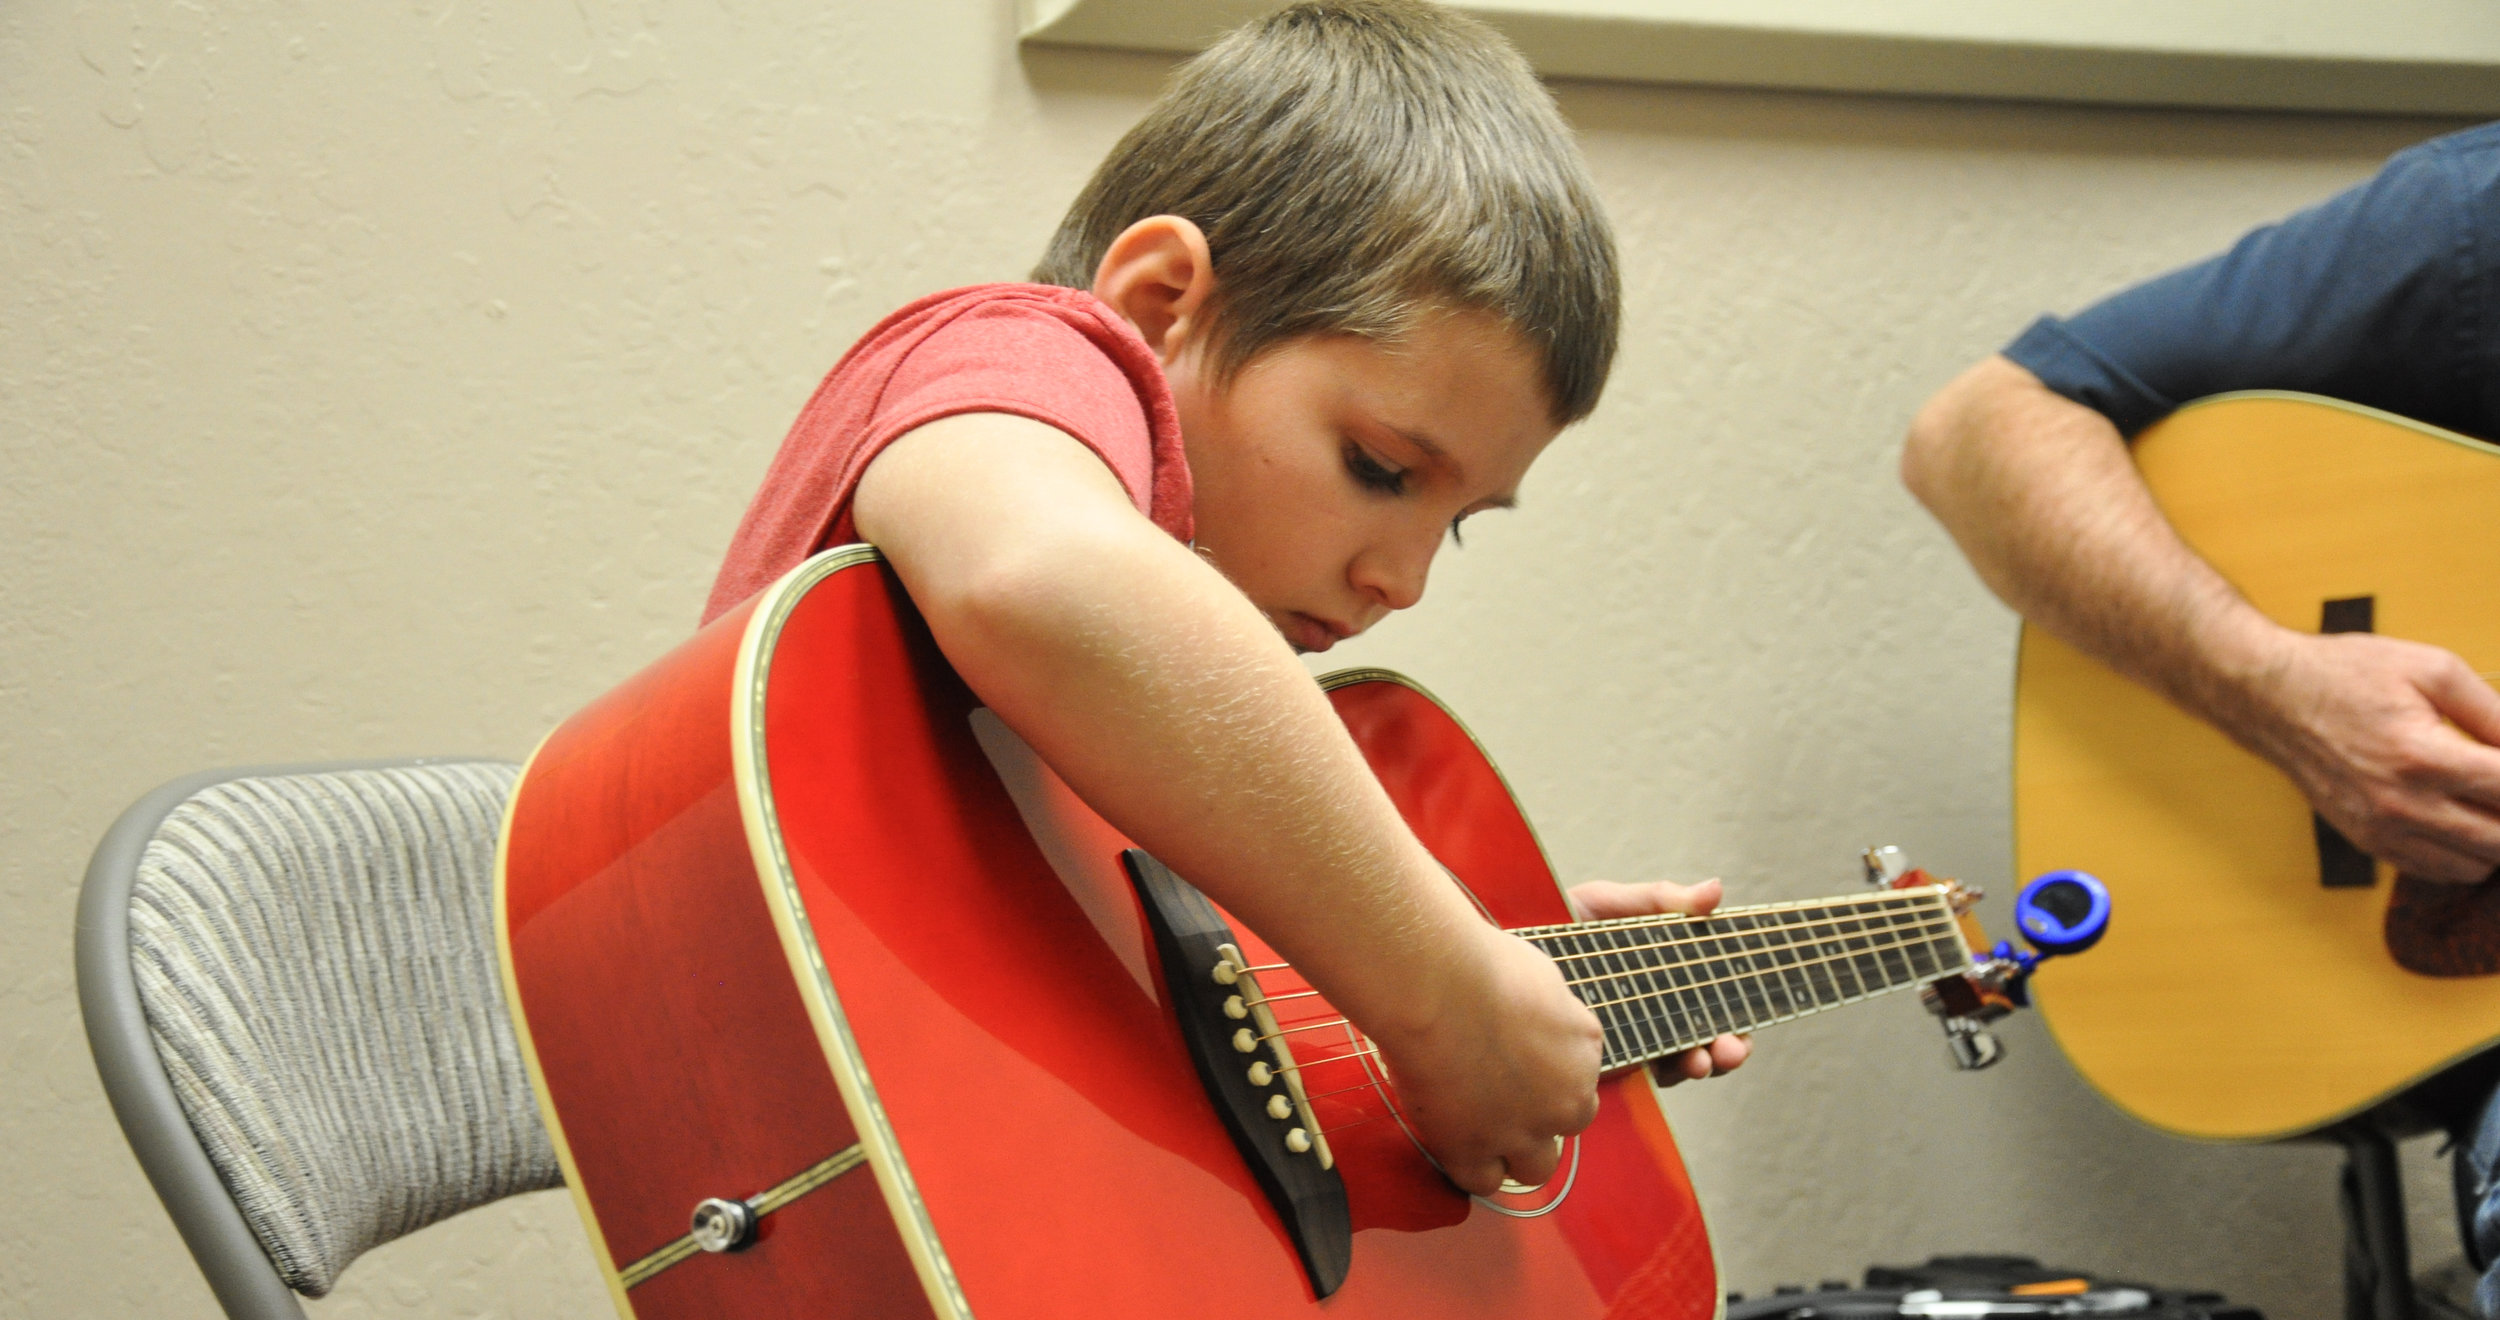 Samy with guitar.jpg